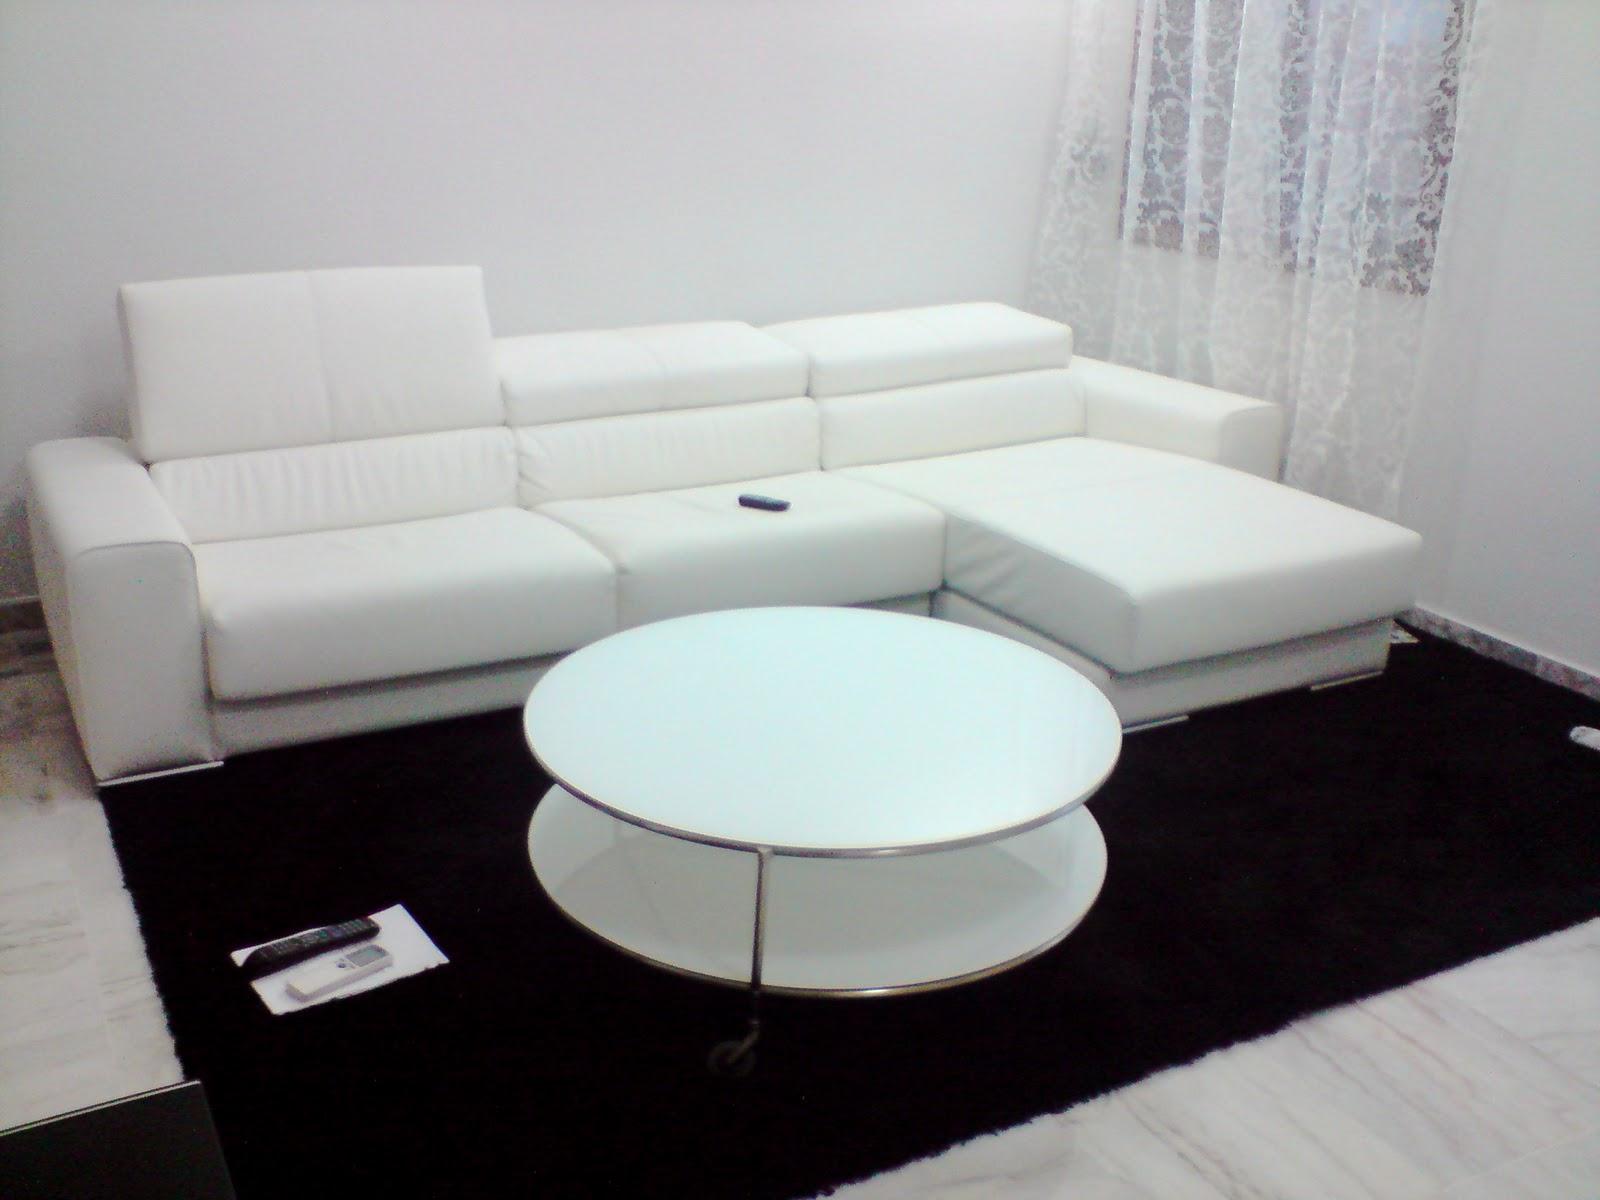 Decoraci n inexperta septiembre 2010 - Ikea catalogo alfombras ...